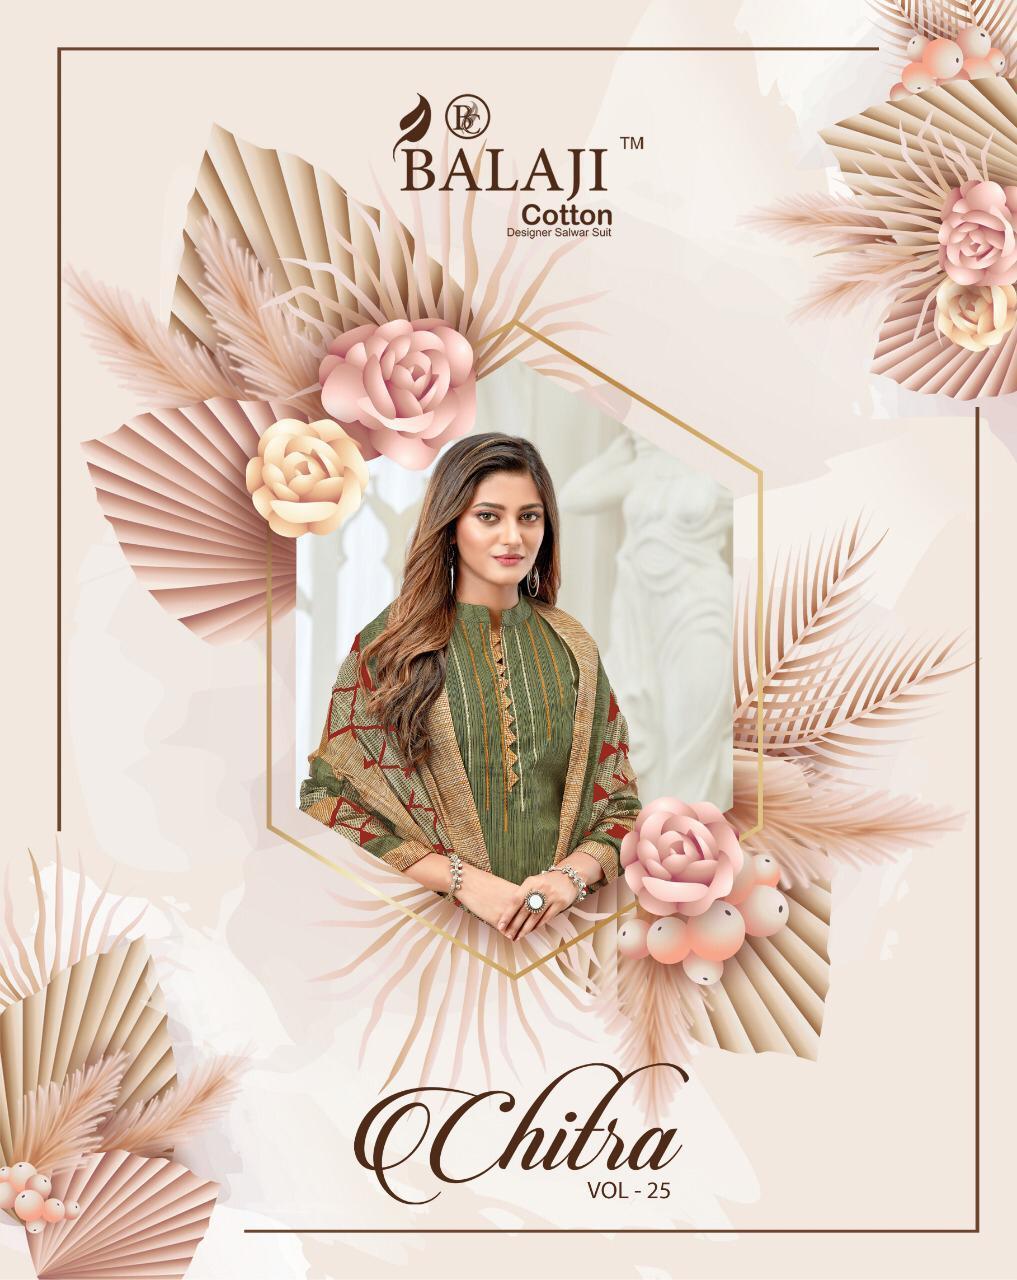 Balaji-Chitra-Vol-25-1